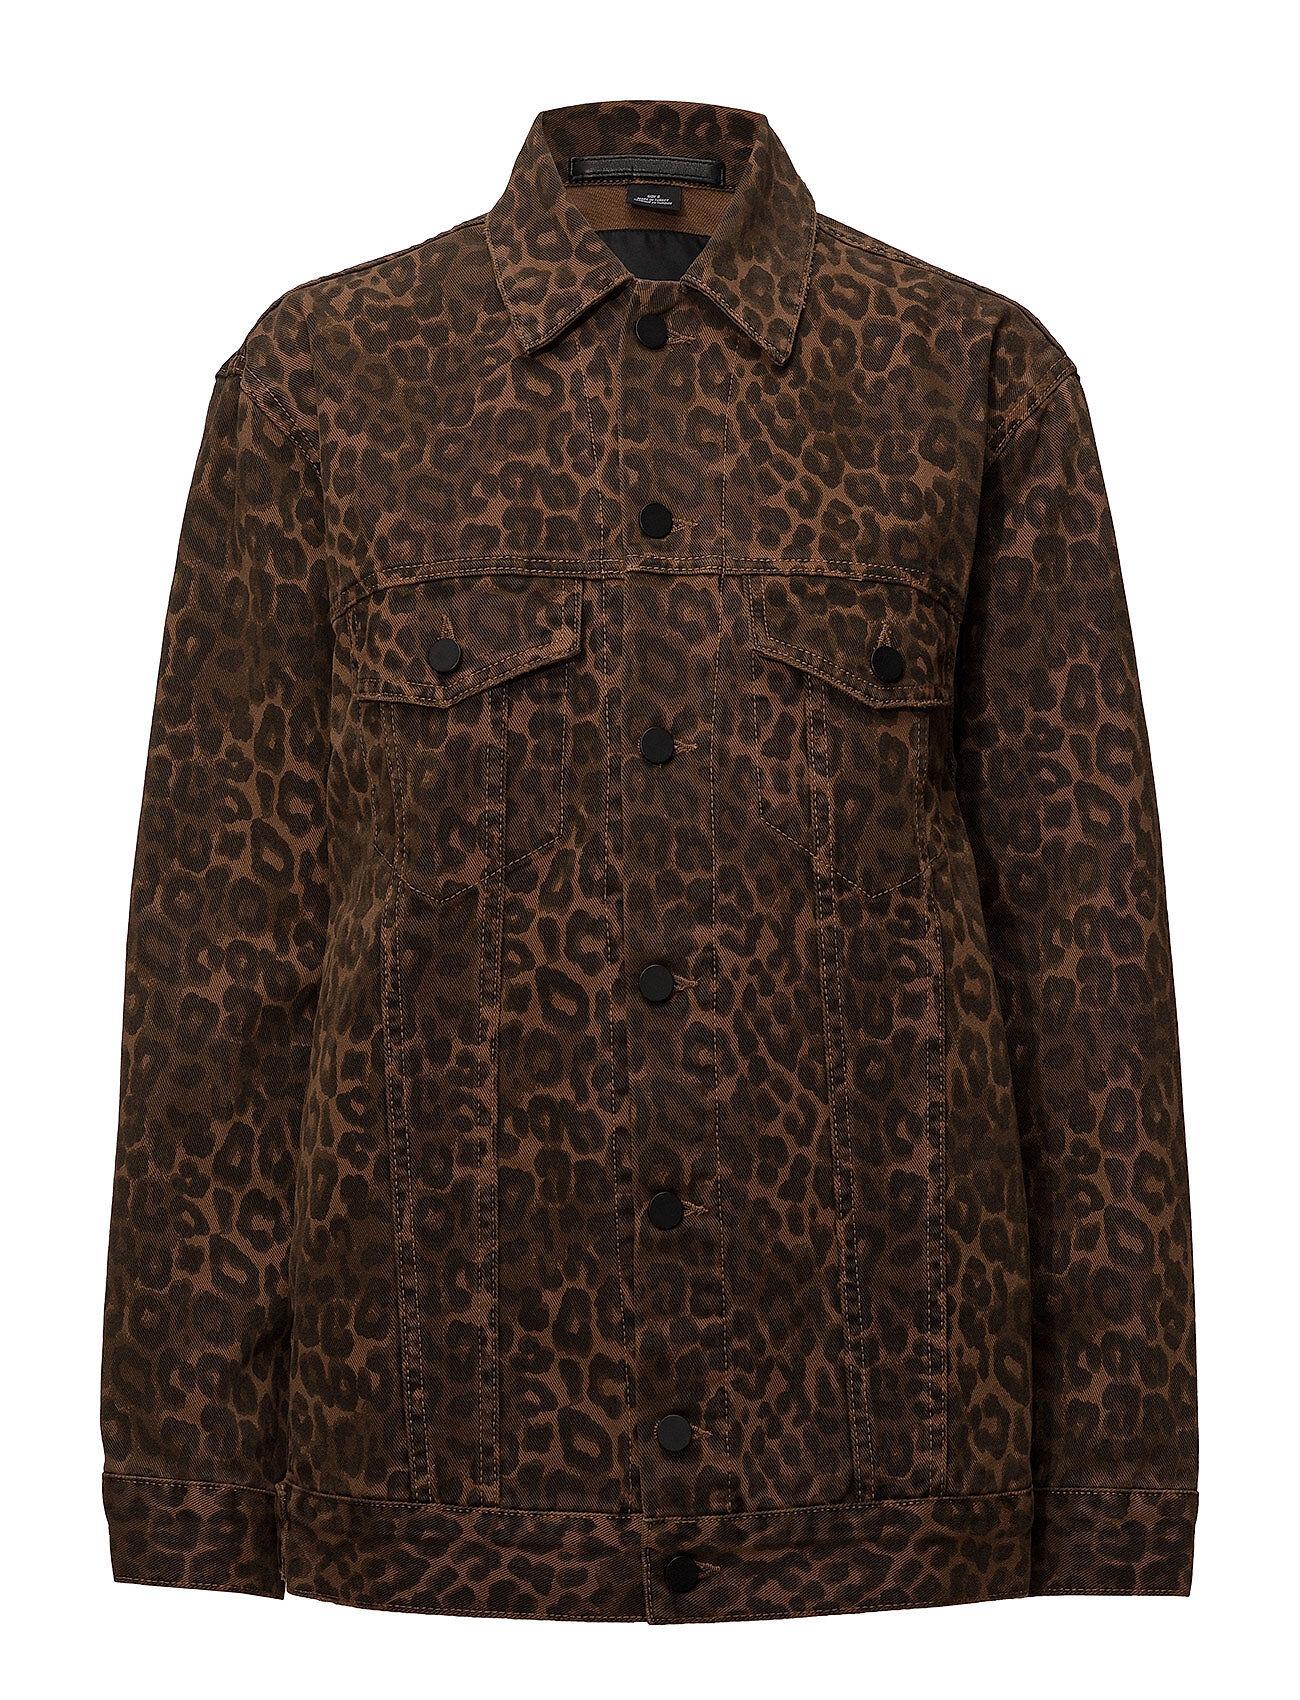 T by Alexander Wang Daze Jacket Tan Leopard Print